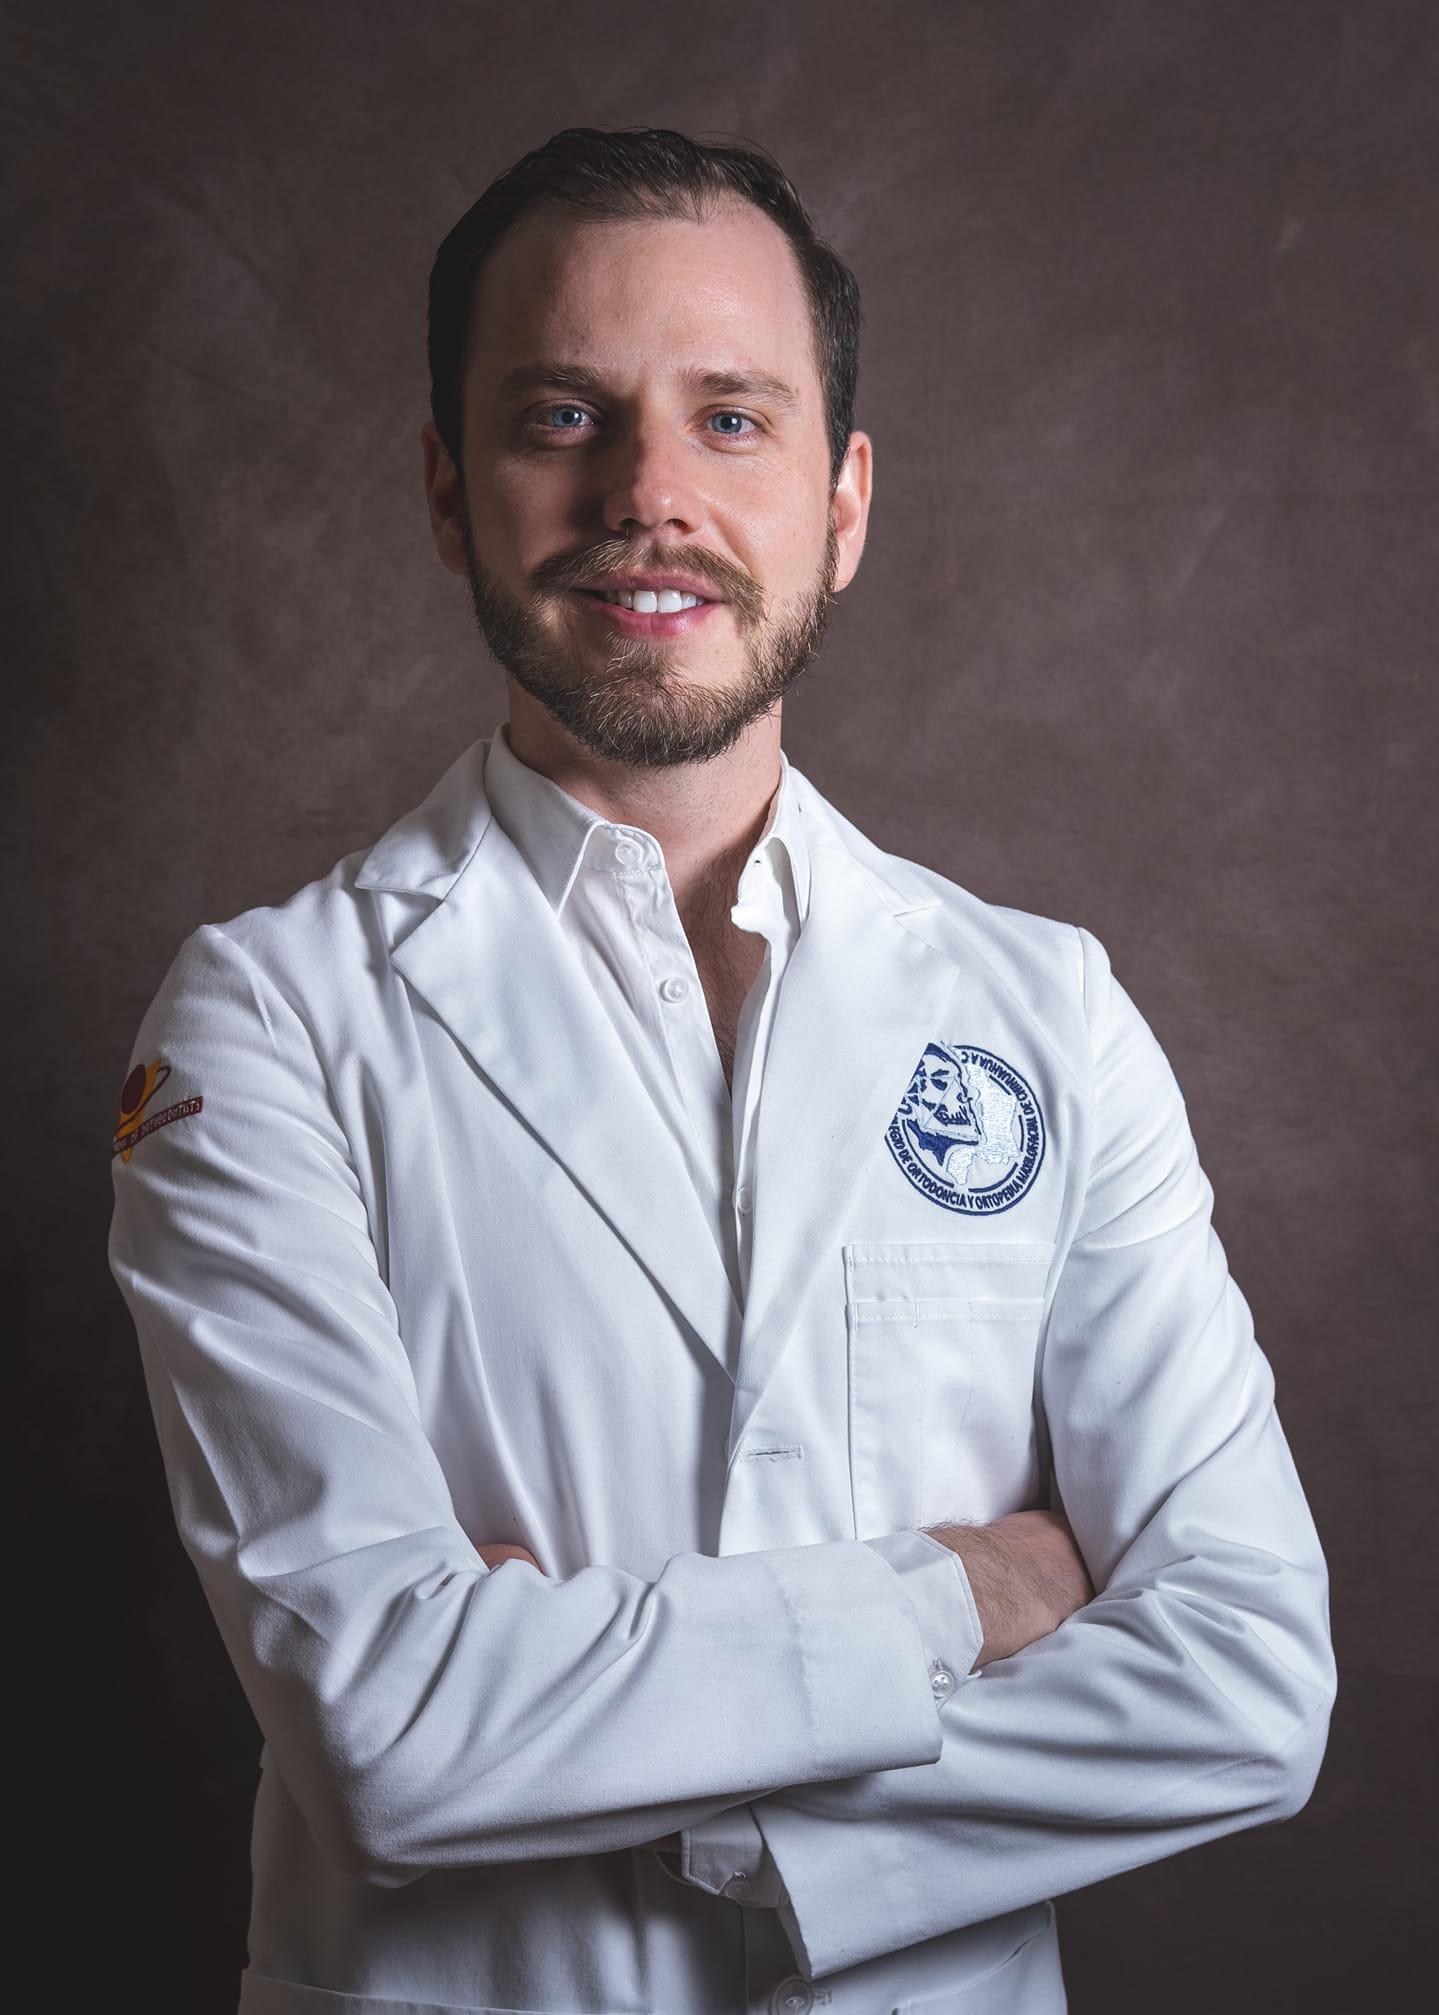 Dr. Fermin Ocanas orthodontist